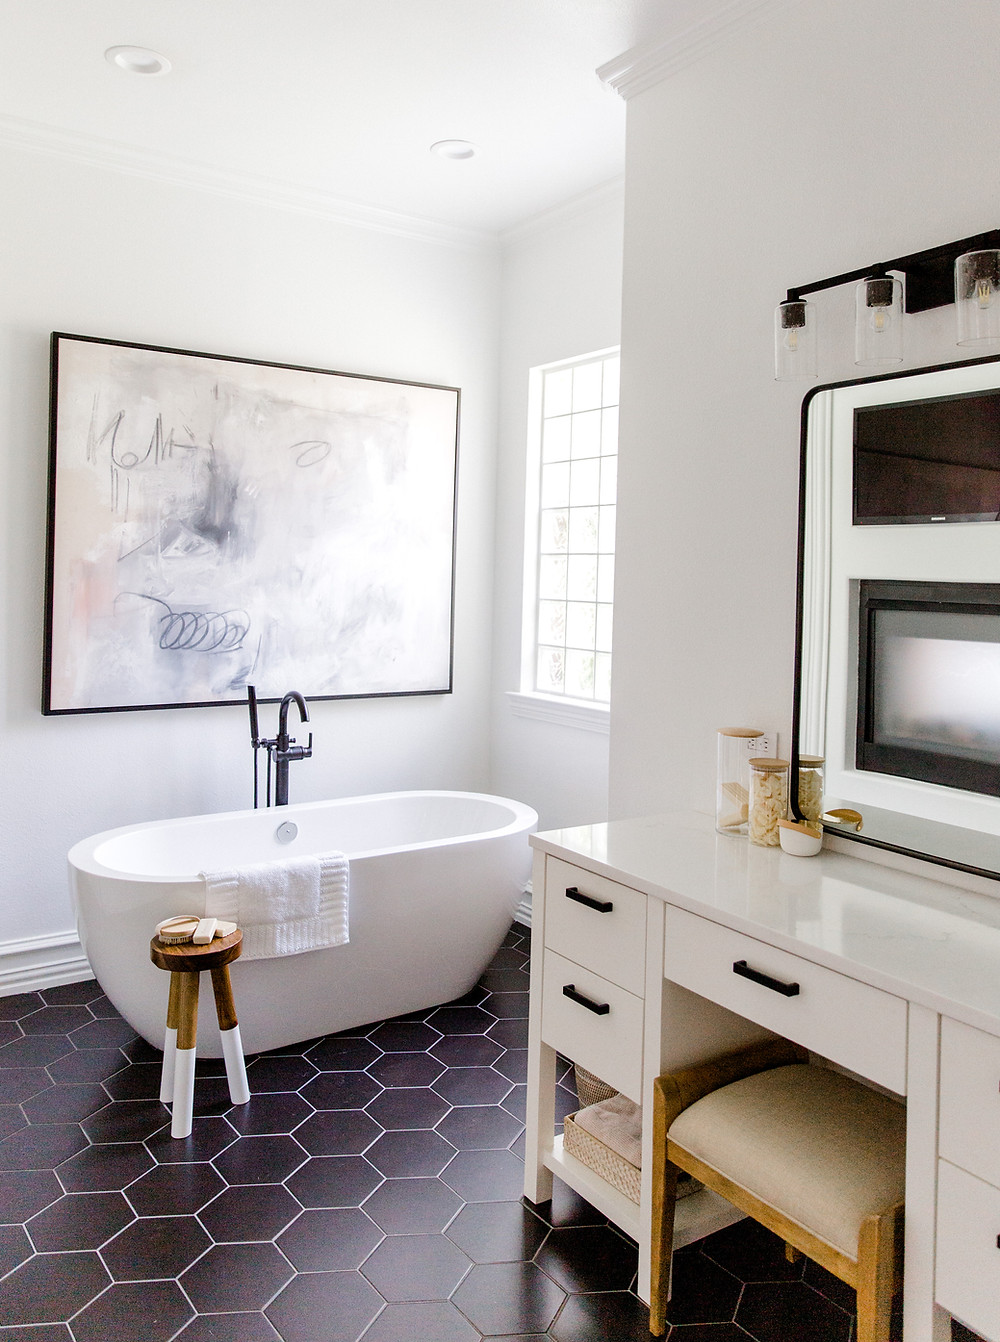 Bathroom design by Laura Design and Co, Dallas interior designer